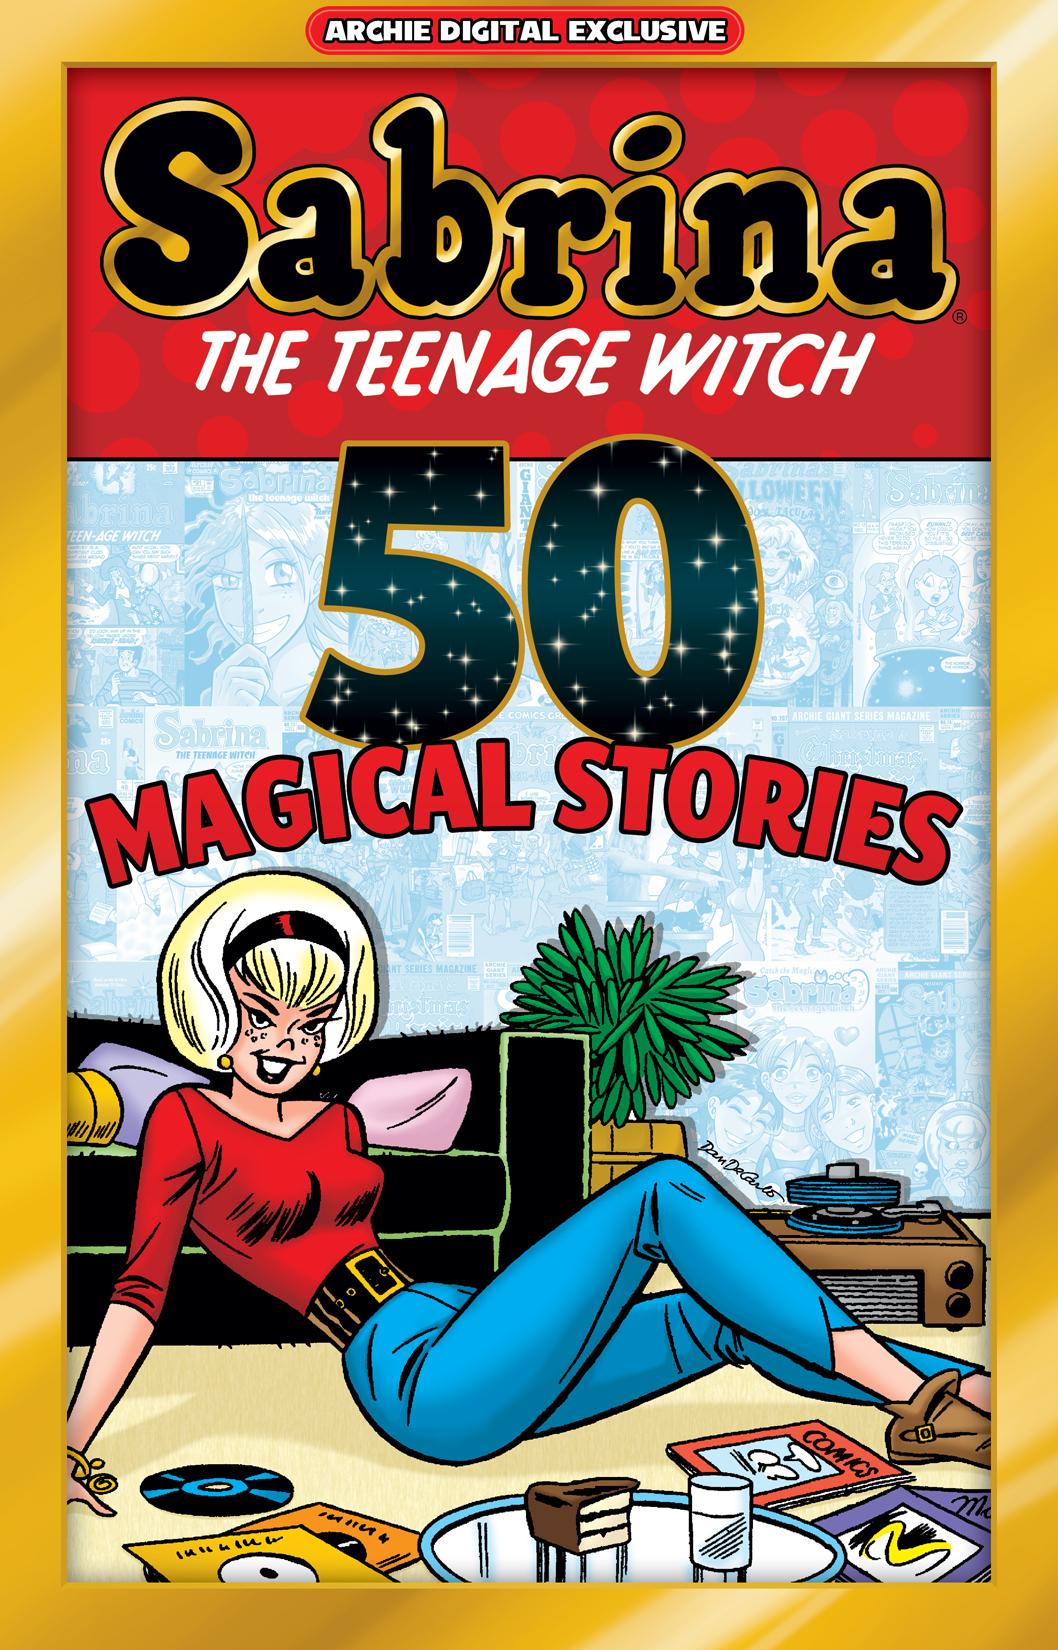 Archie comics archie comics sneak peek of the week major spoilers - Sabrina